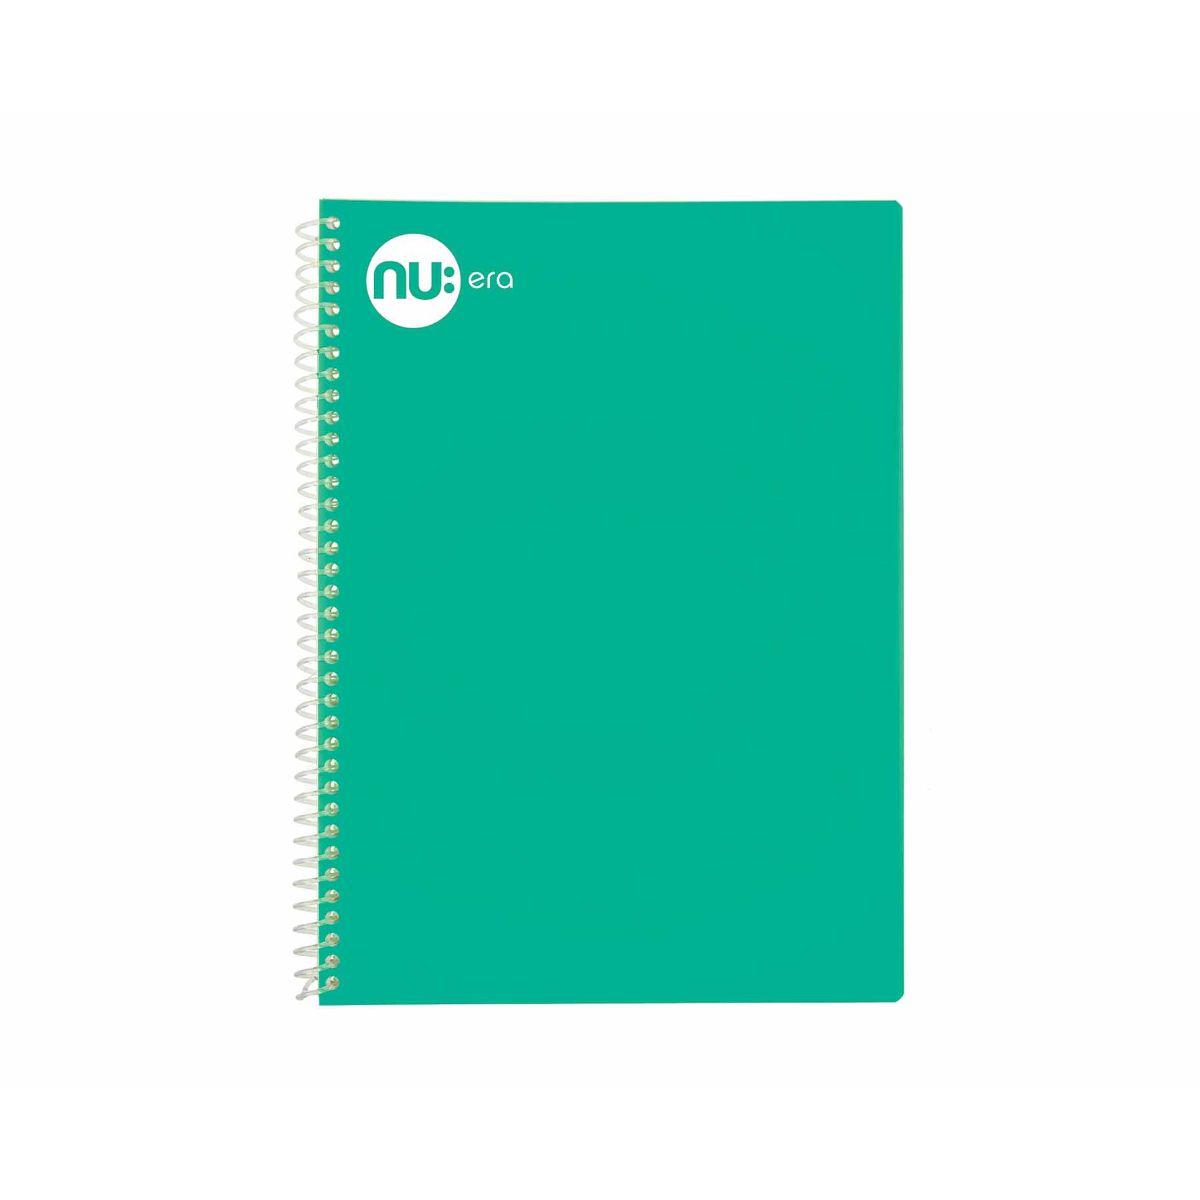 Notepads Pads & Books Stationery - Ryman